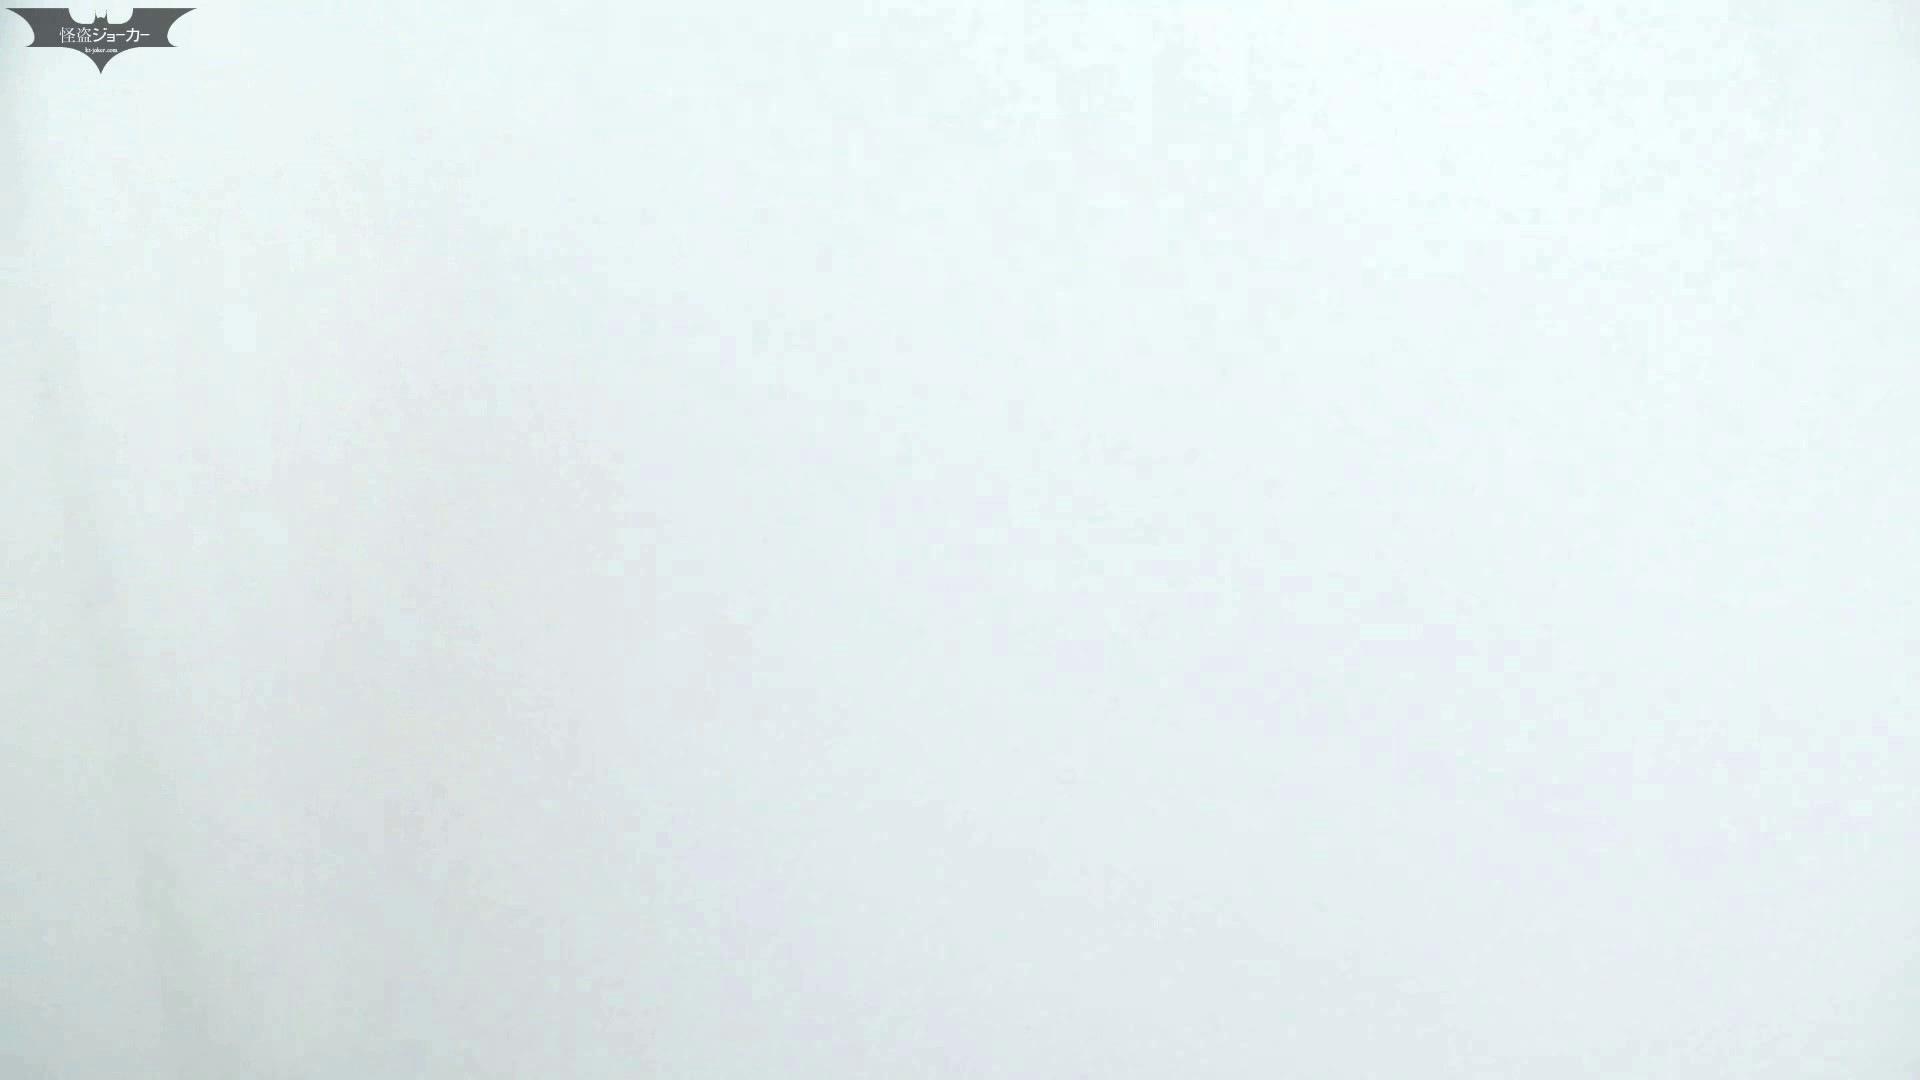 Vol.06 ピチピチが入室きめ細かくマッシュルームのような肌に癒される OL女体 オマンコ無修正動画無料 65連発 14